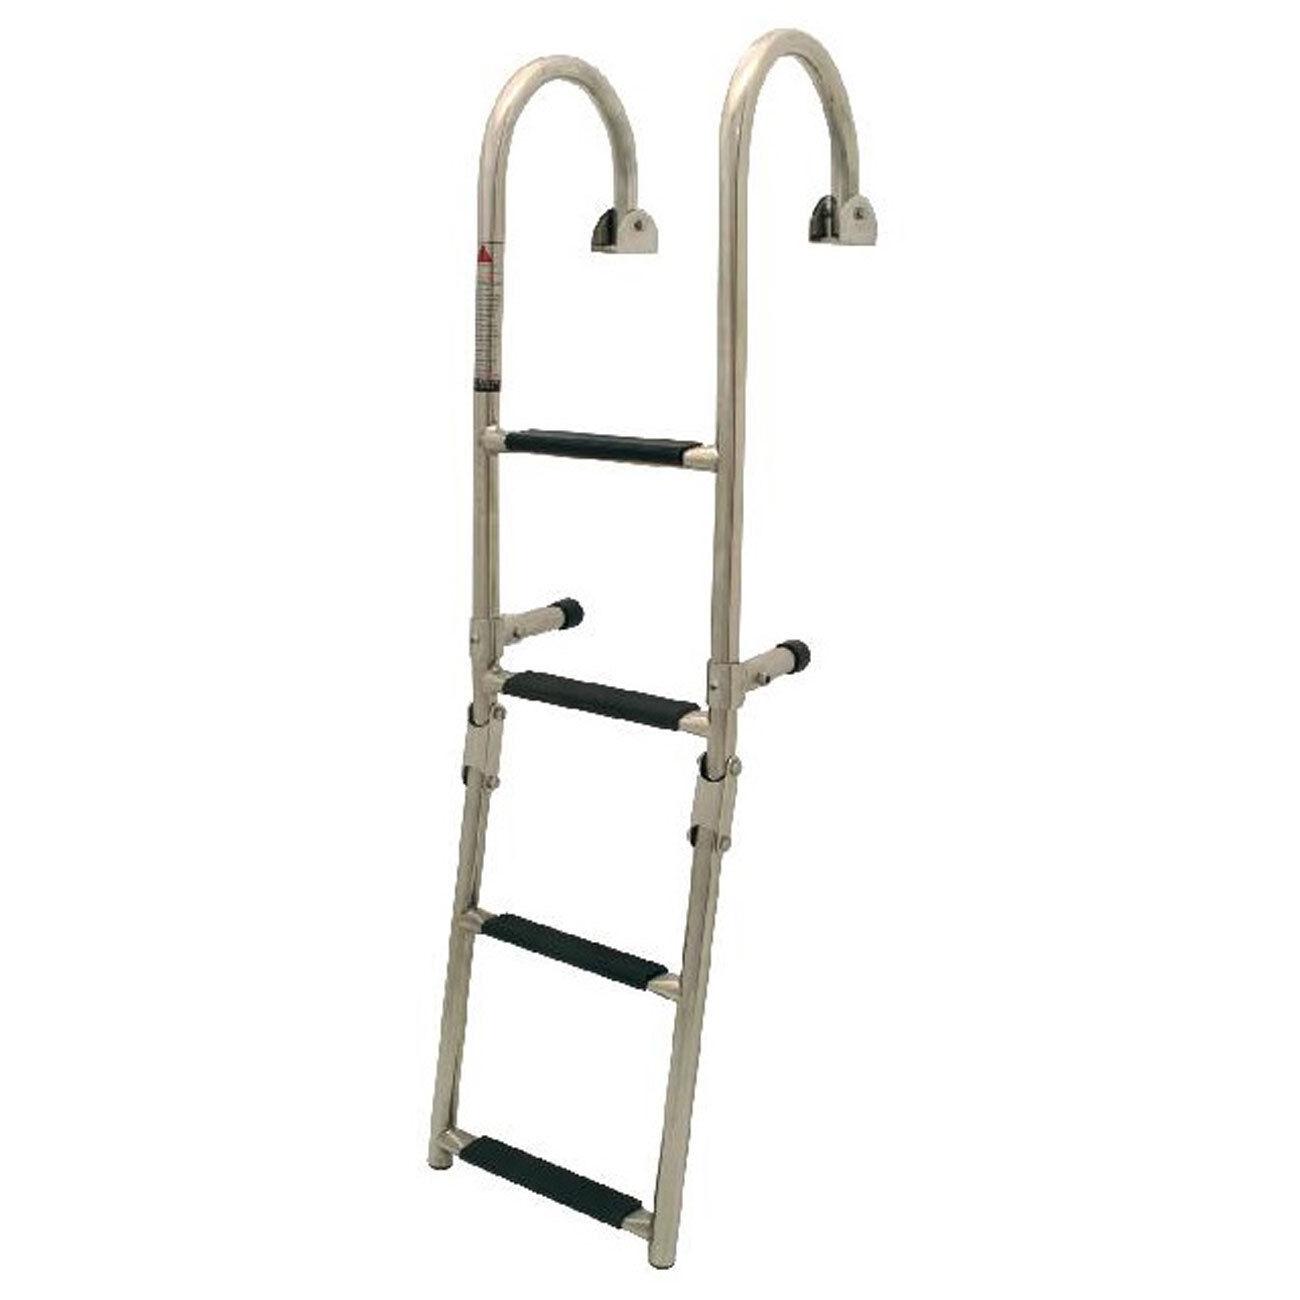 Lalizas   Nuova Rade Stainless Steel Boarding Ladder for Ship's Rail 3 - 5 Steps